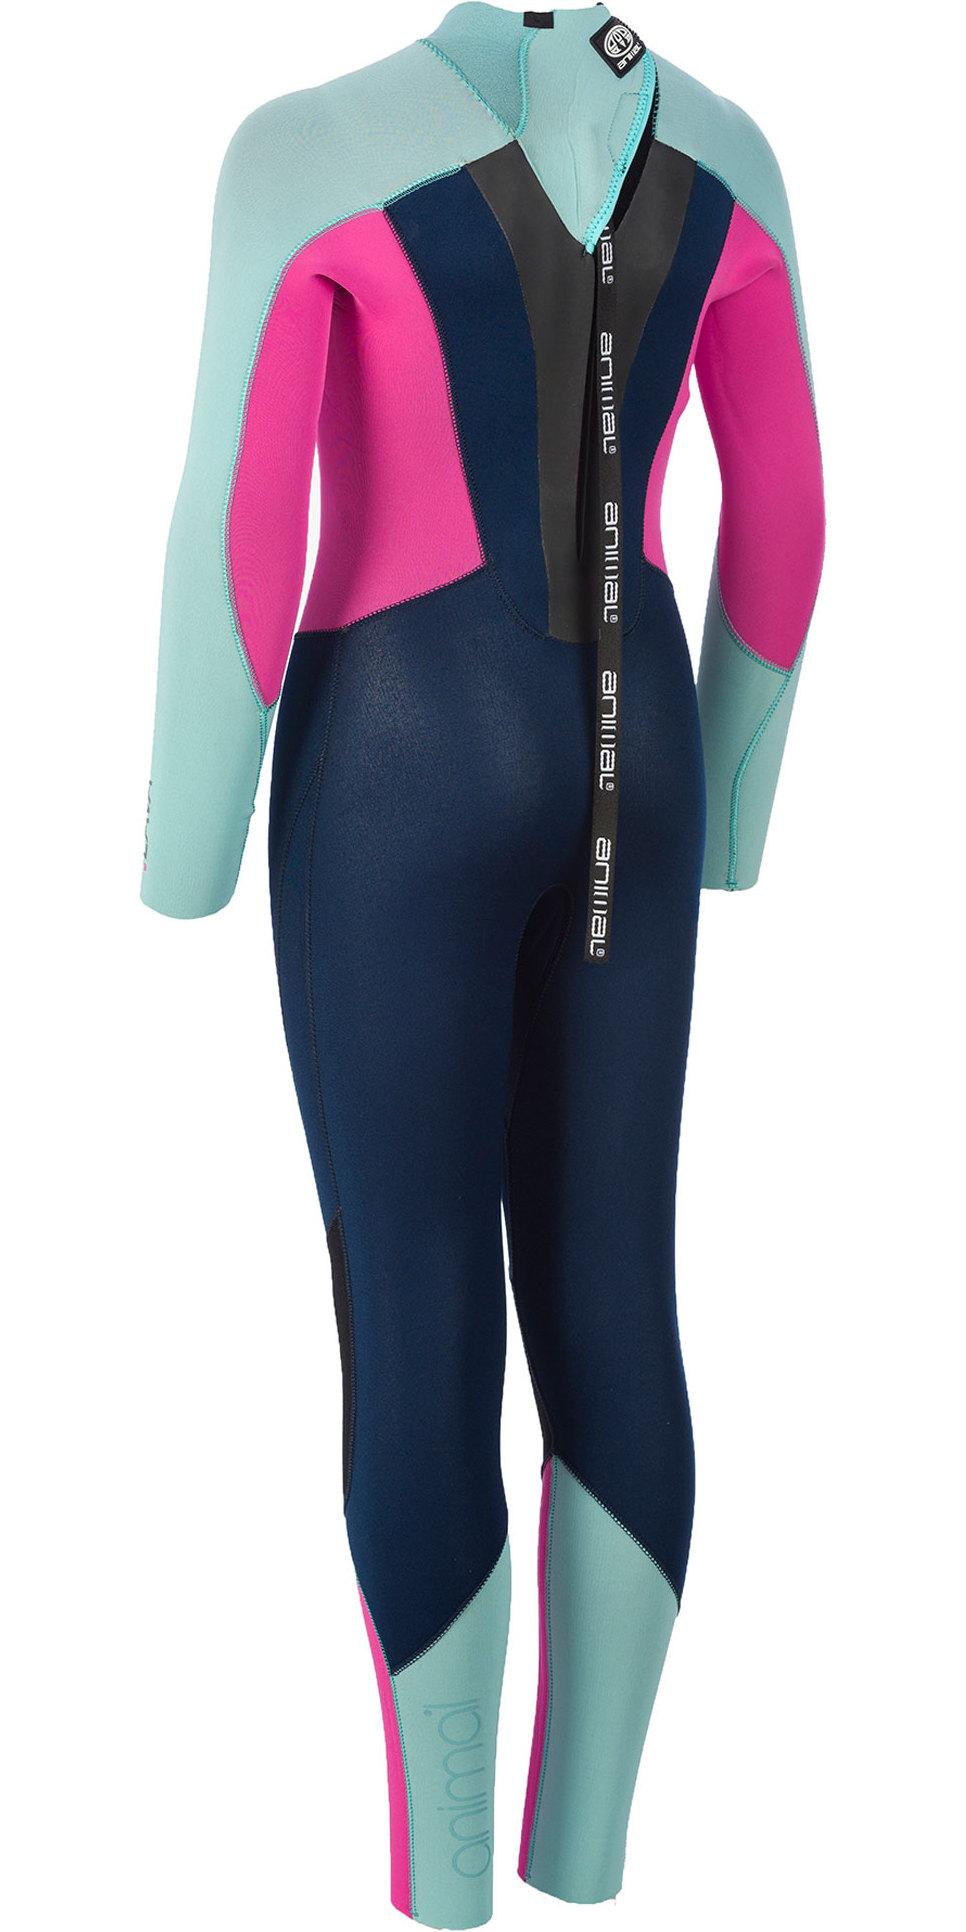 2019 Animal Junior Girls Lava 5/4/3mm GBS Back Zip Wetsuit Navy AW9WQ800